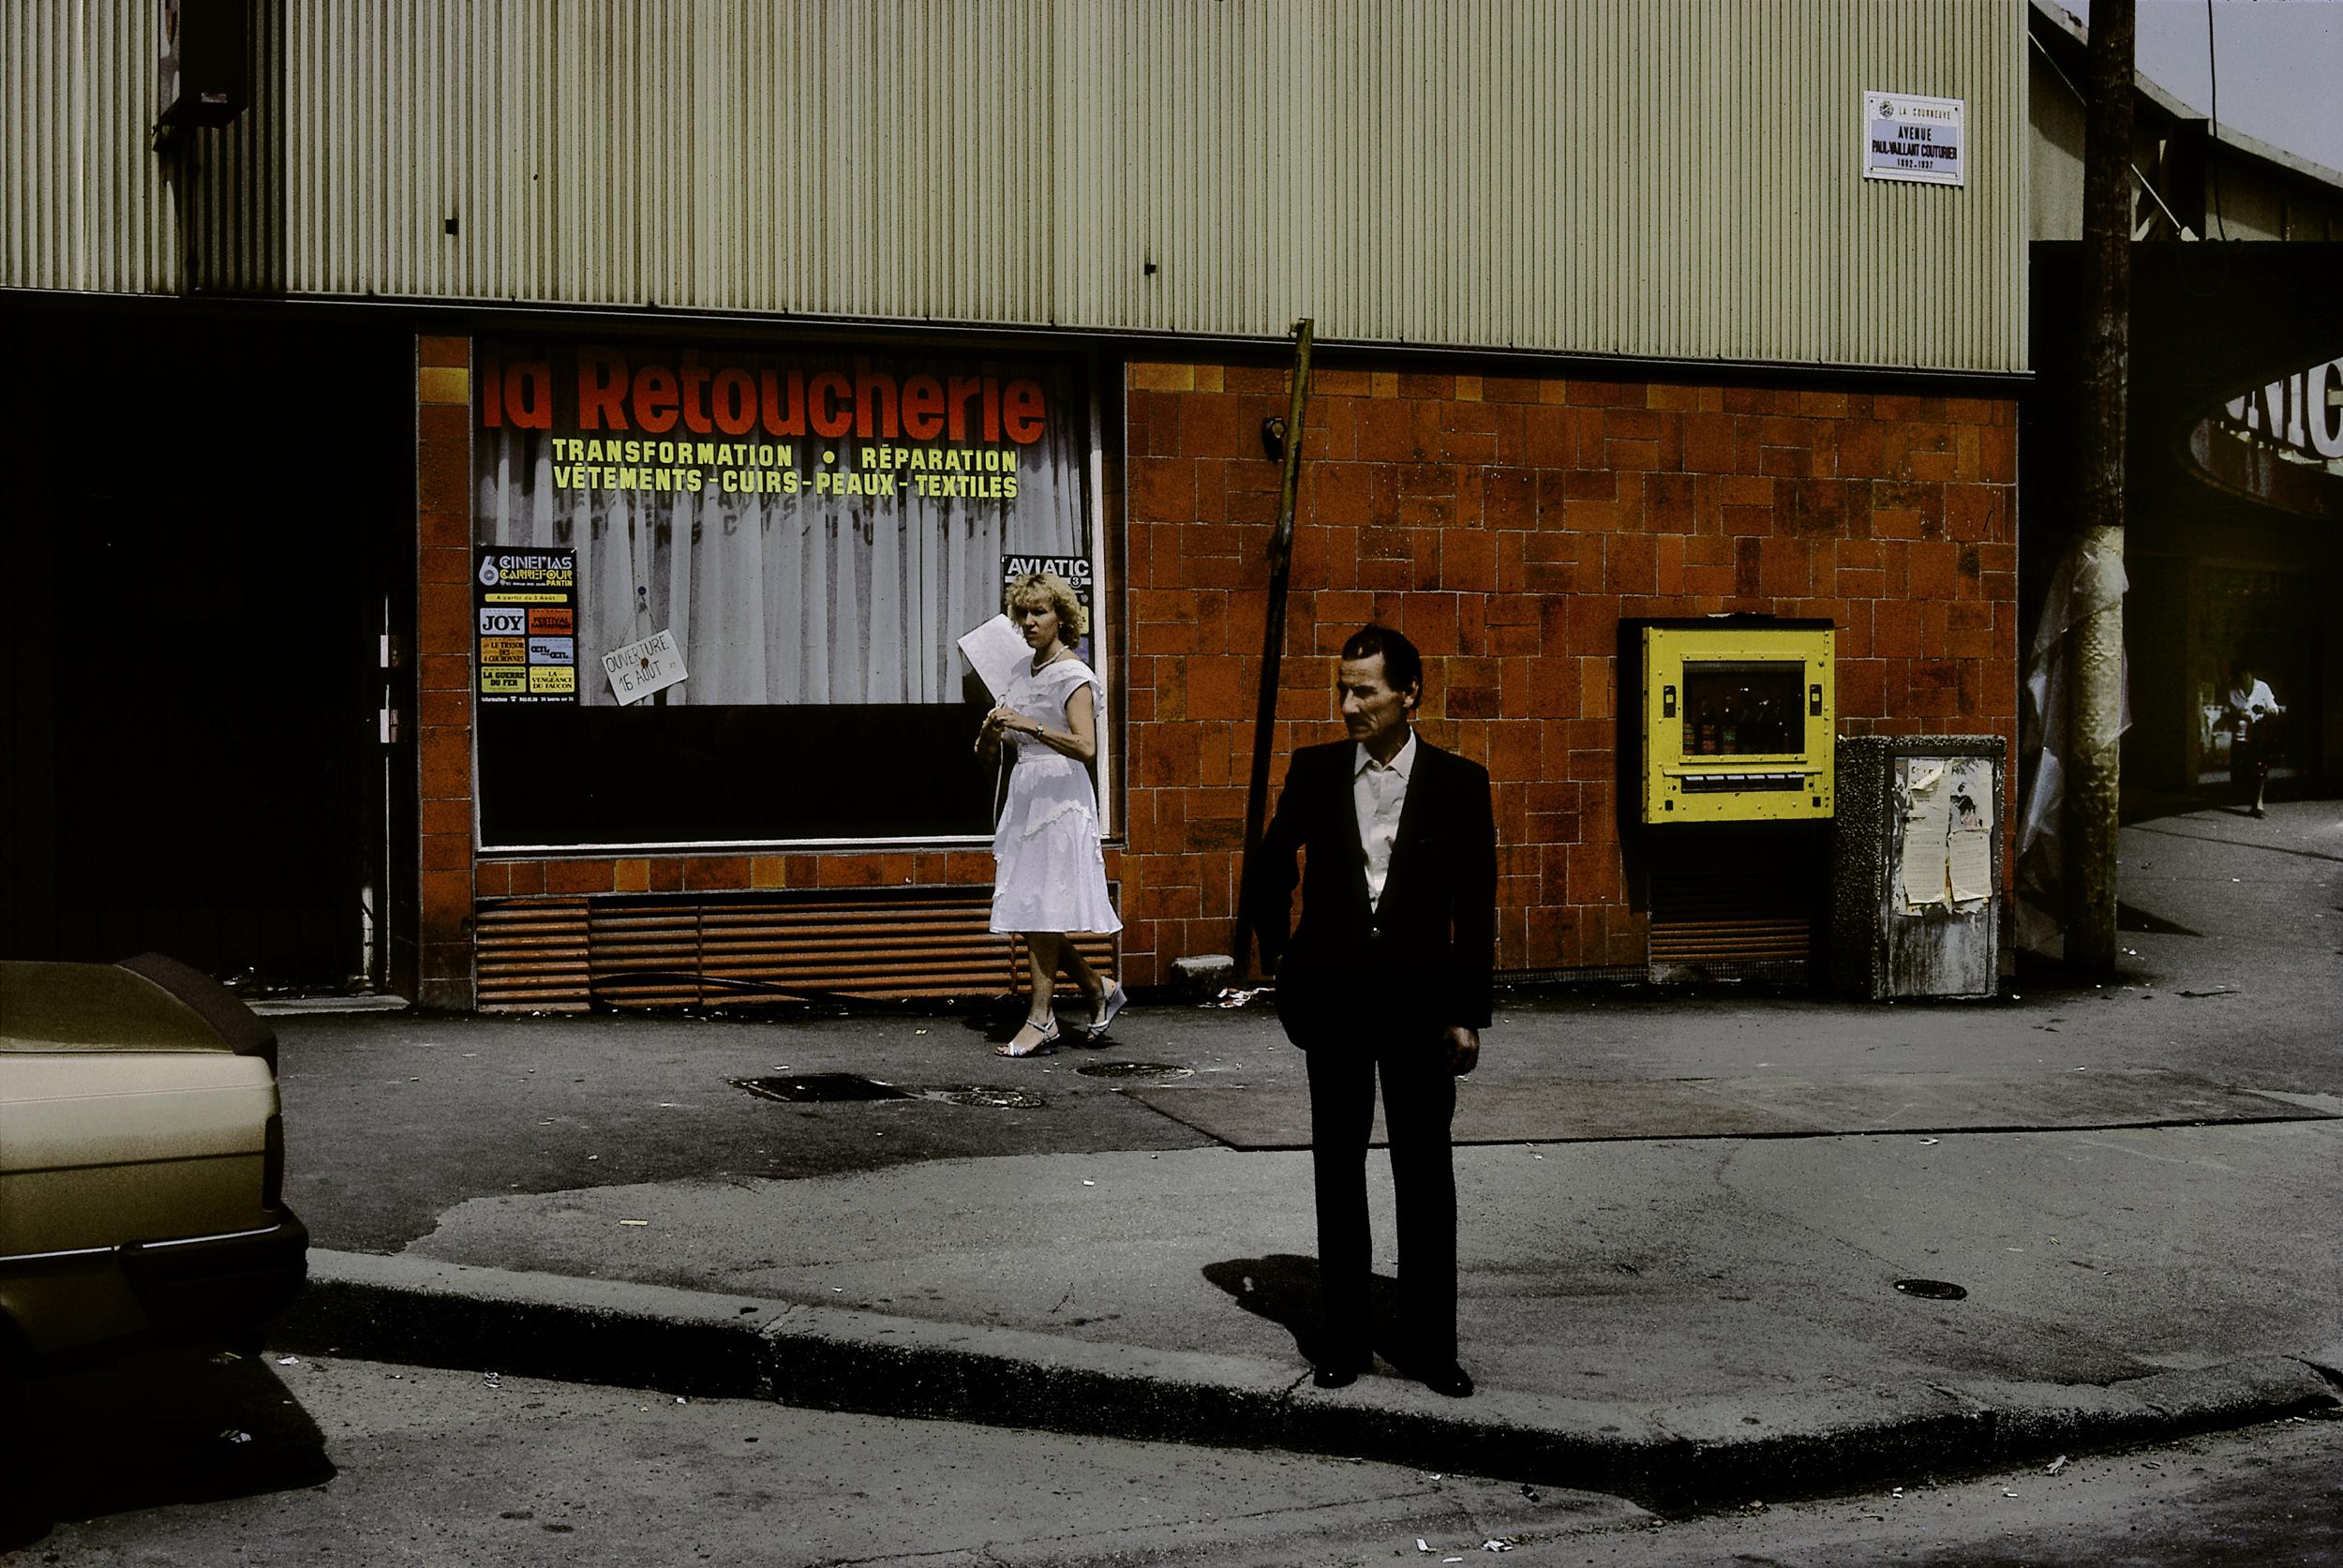 HARRYGRUYAERT_FOTO_1 (c) Harry Gruyaert - Magnum Photos